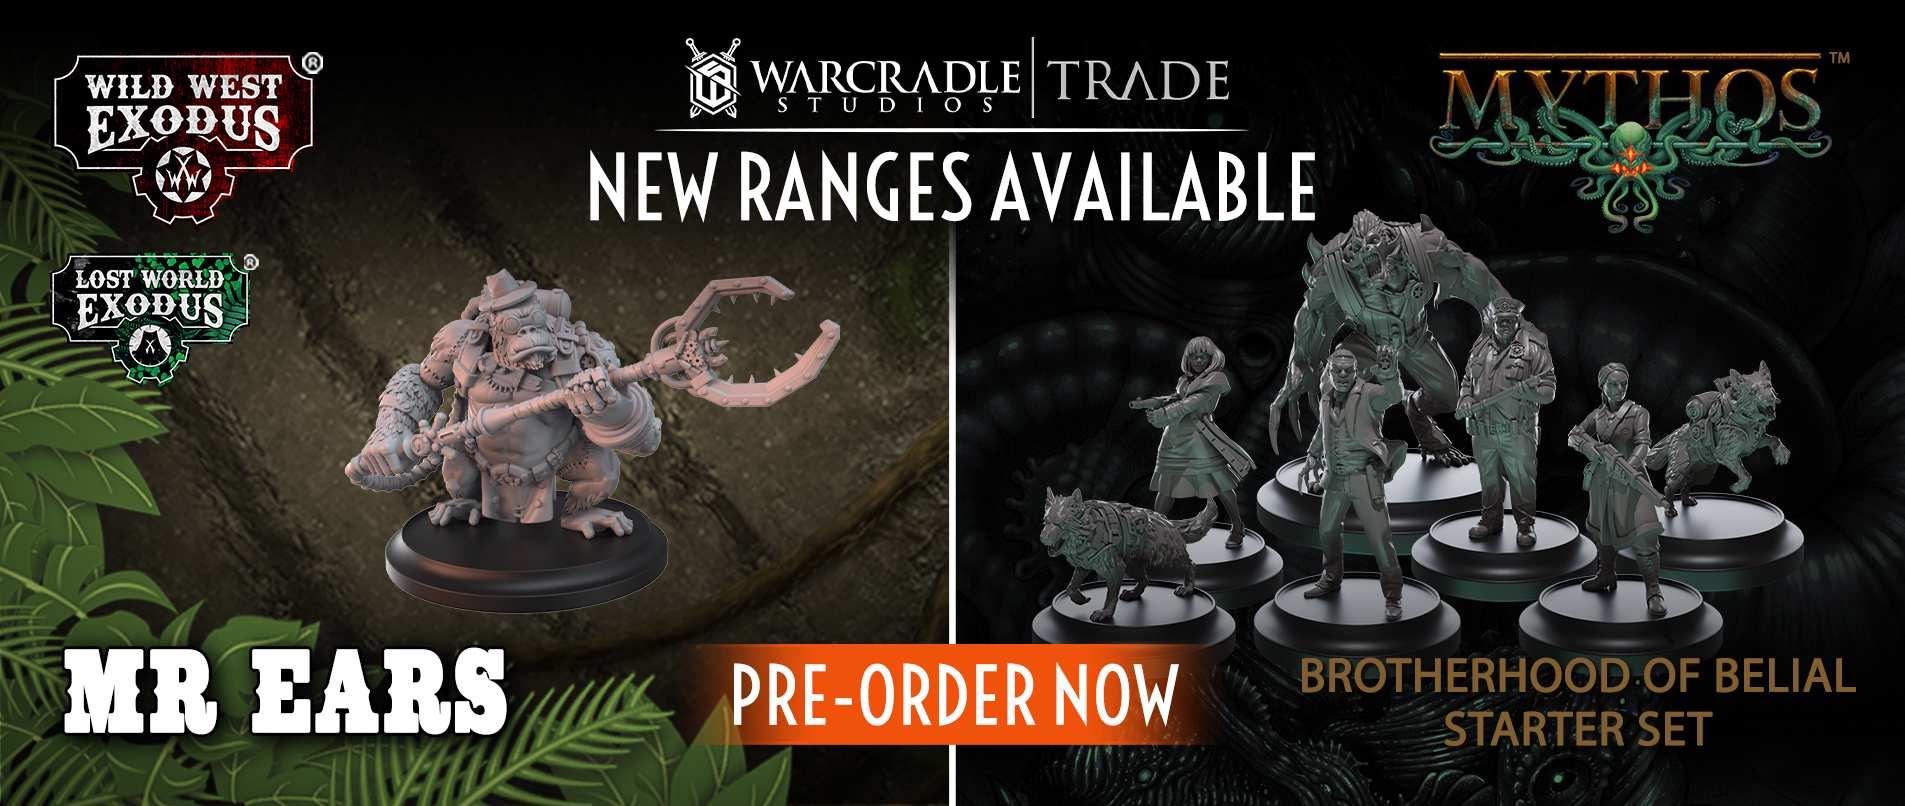 Warcradle Studios Trade Website - Mythos, Wild West Exodus and more